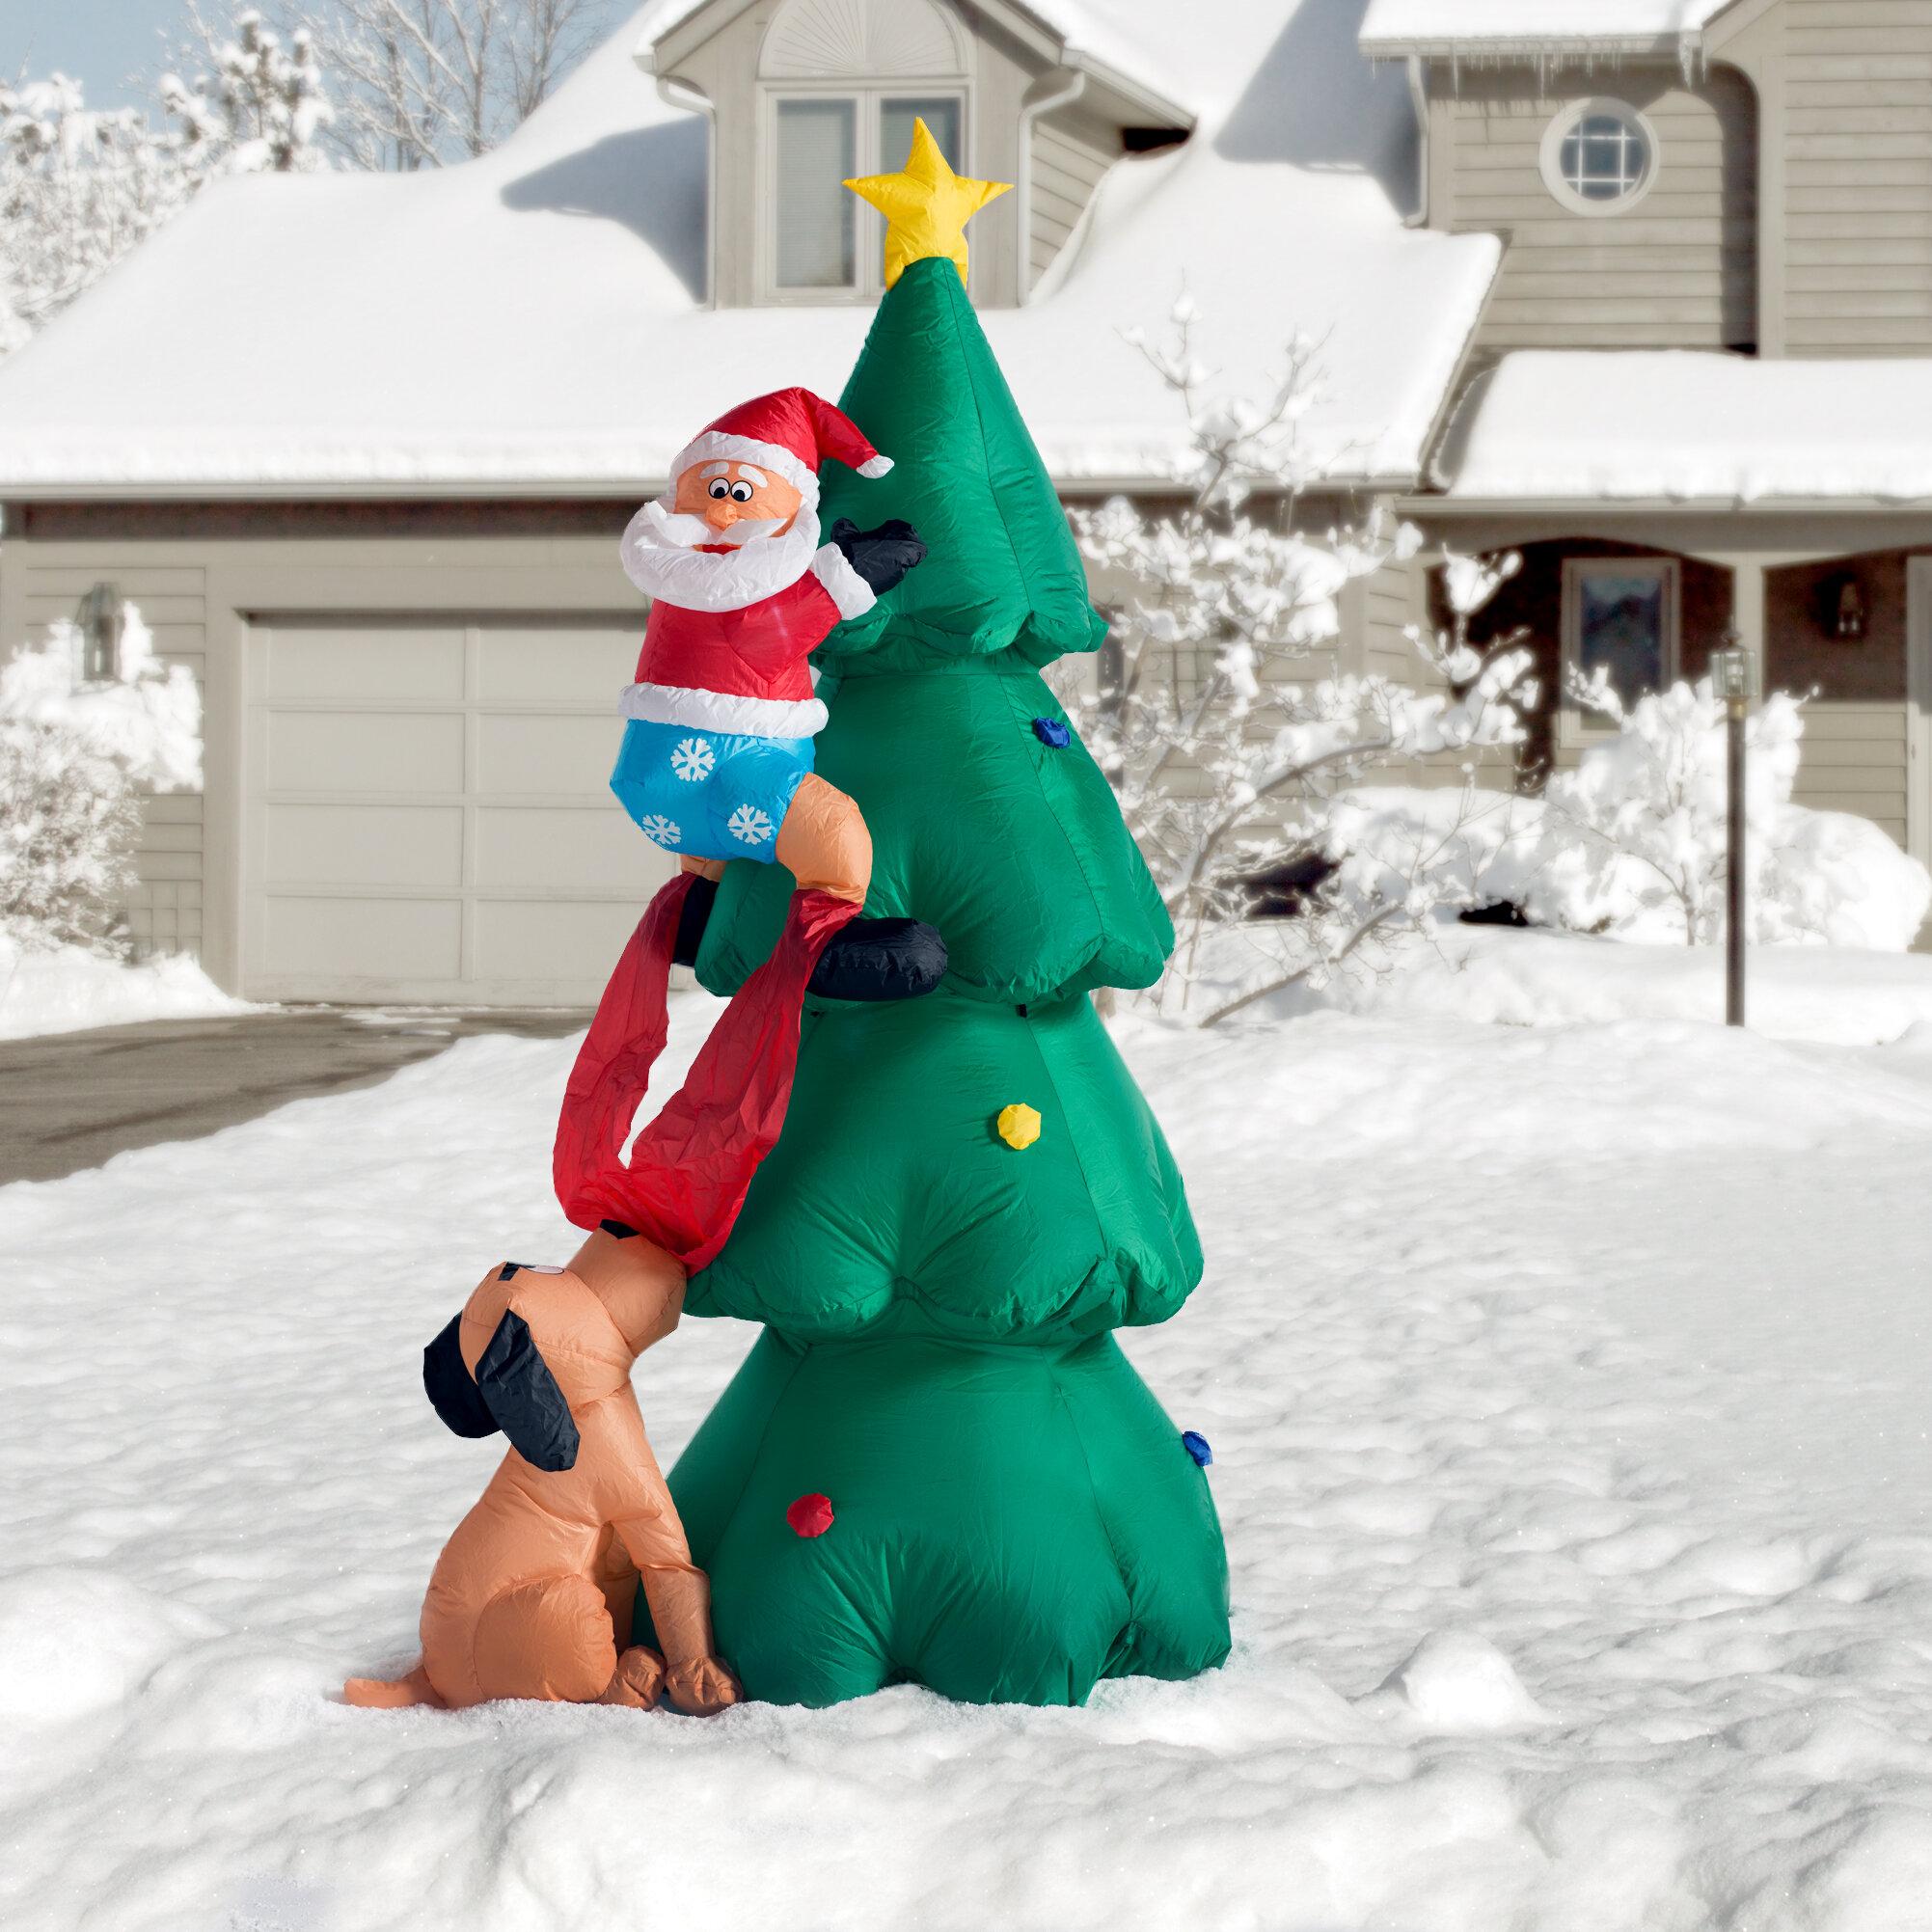 Inflatable Christmas Tree.Christmas Inflatable Santa Claus Climbing On Christmas Tree Decoration